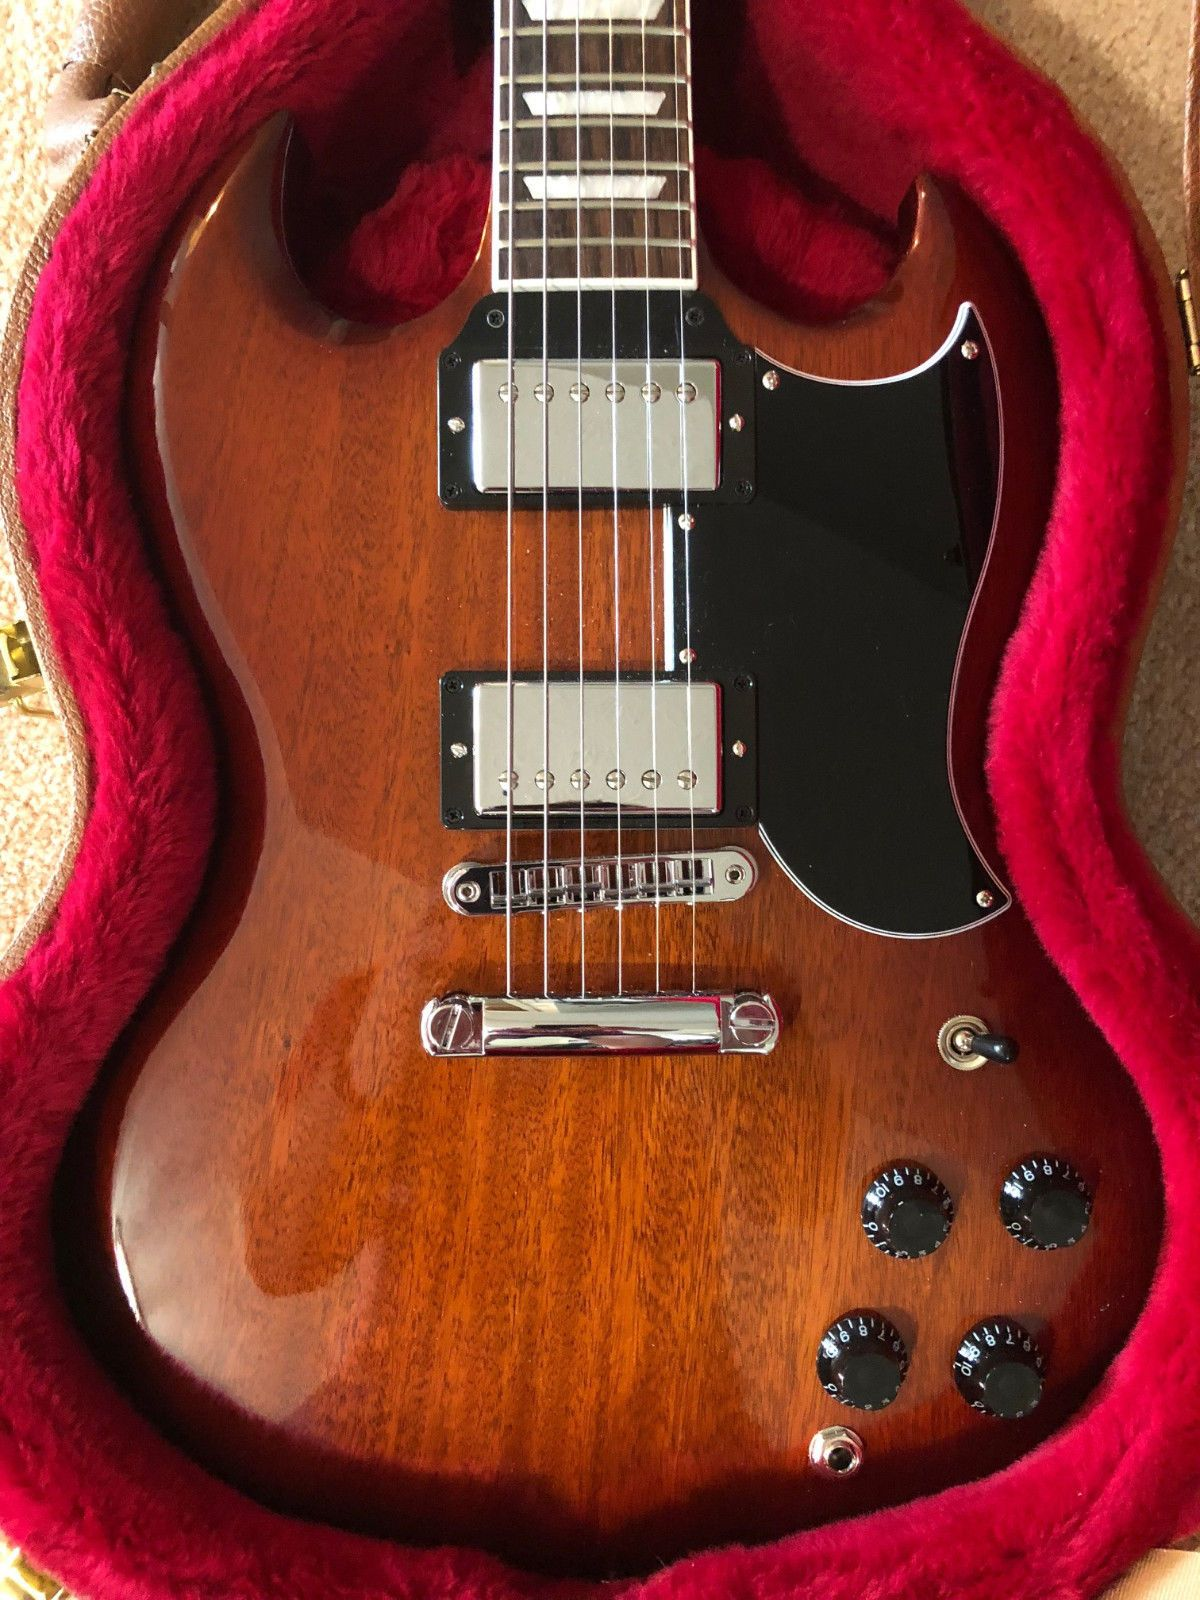 2018 Gibson SG Standard Autumn Shade w/ Gibson Hardshell